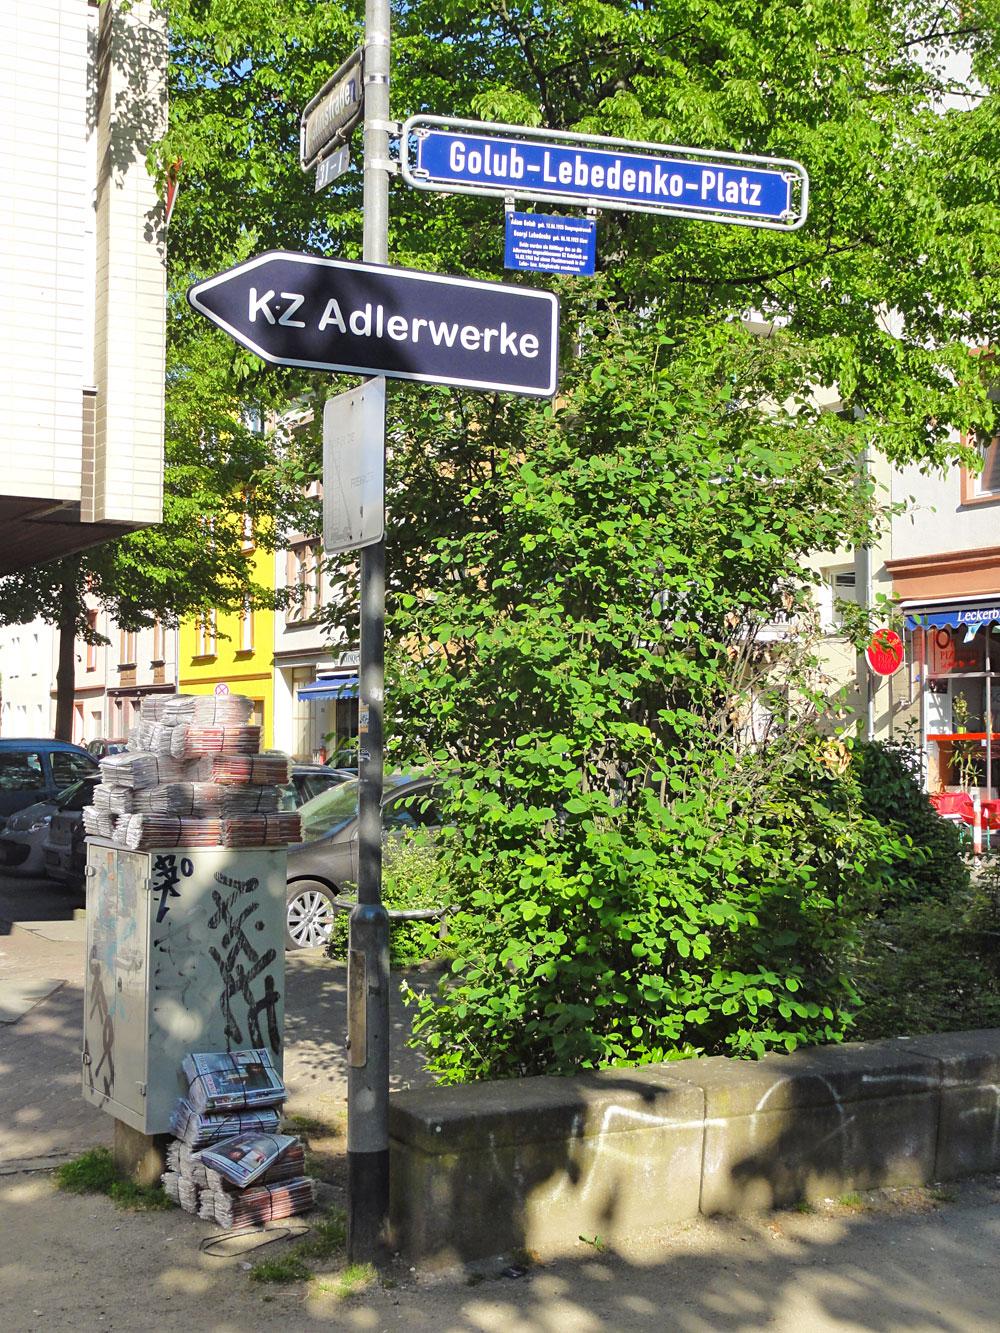 KZ Adlerwerke in Frankfurt am Main